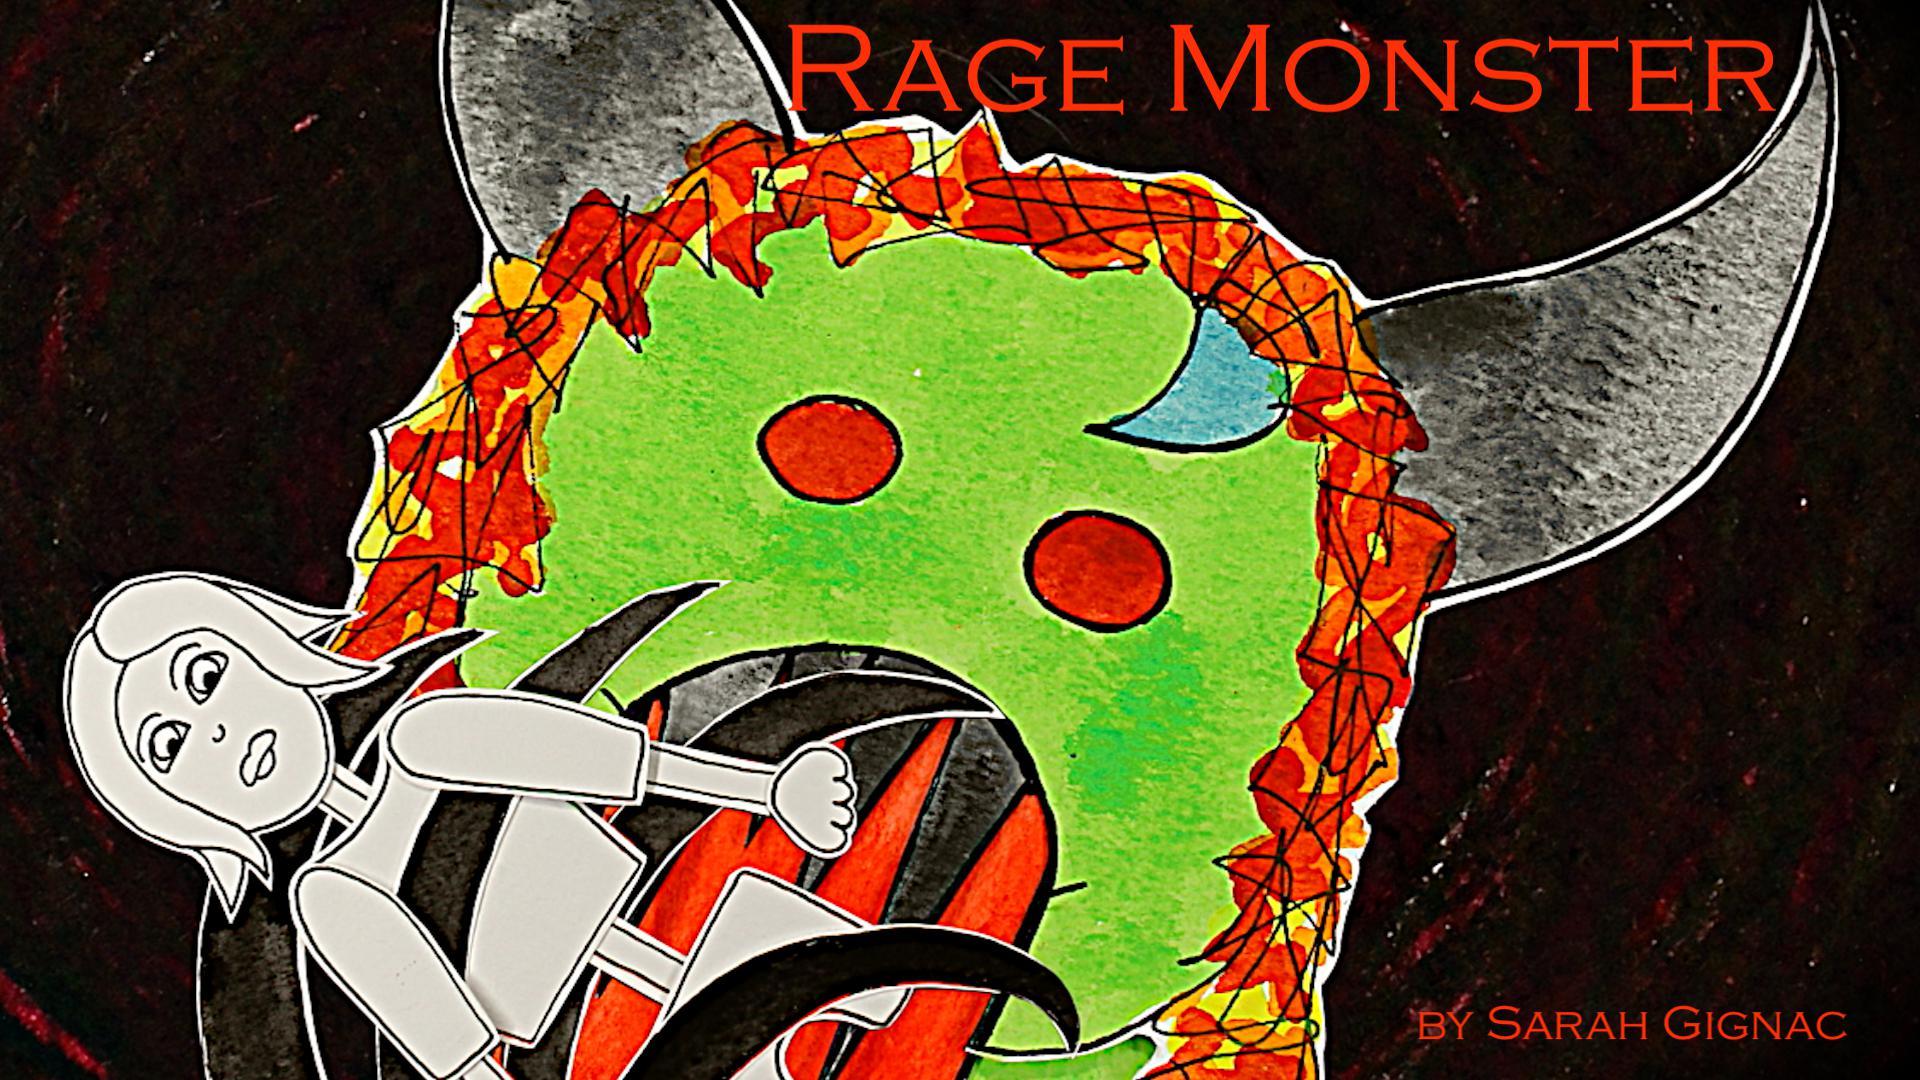 Rage Monster